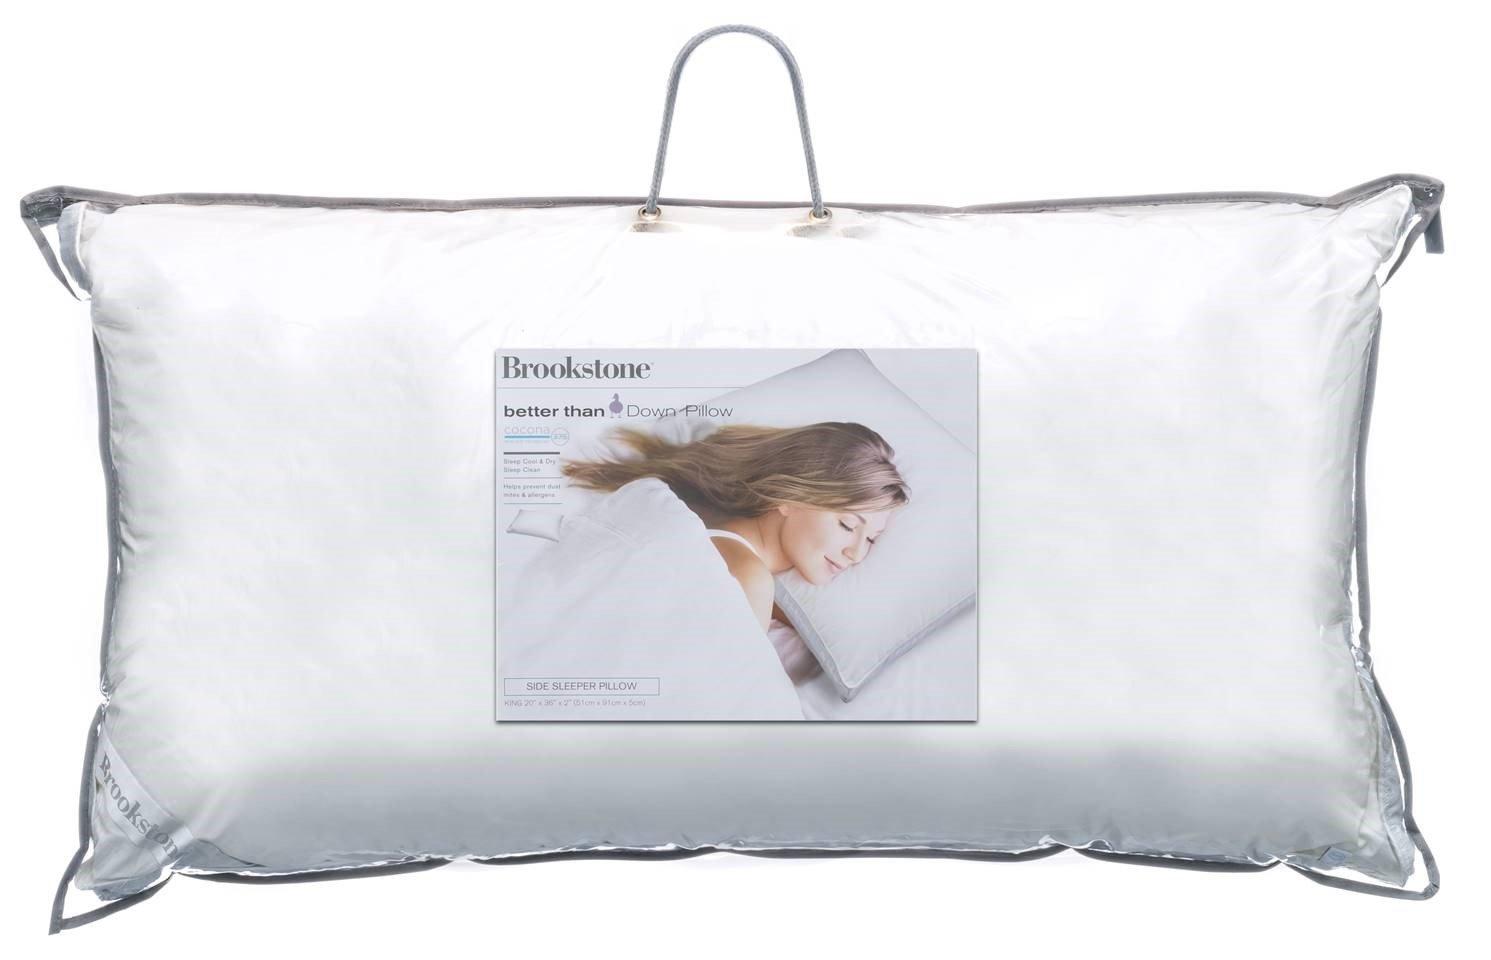 Brookstone Classic Pillow with 37.5 Temperature Regulating Technology, Medium-King, Side Sleeper